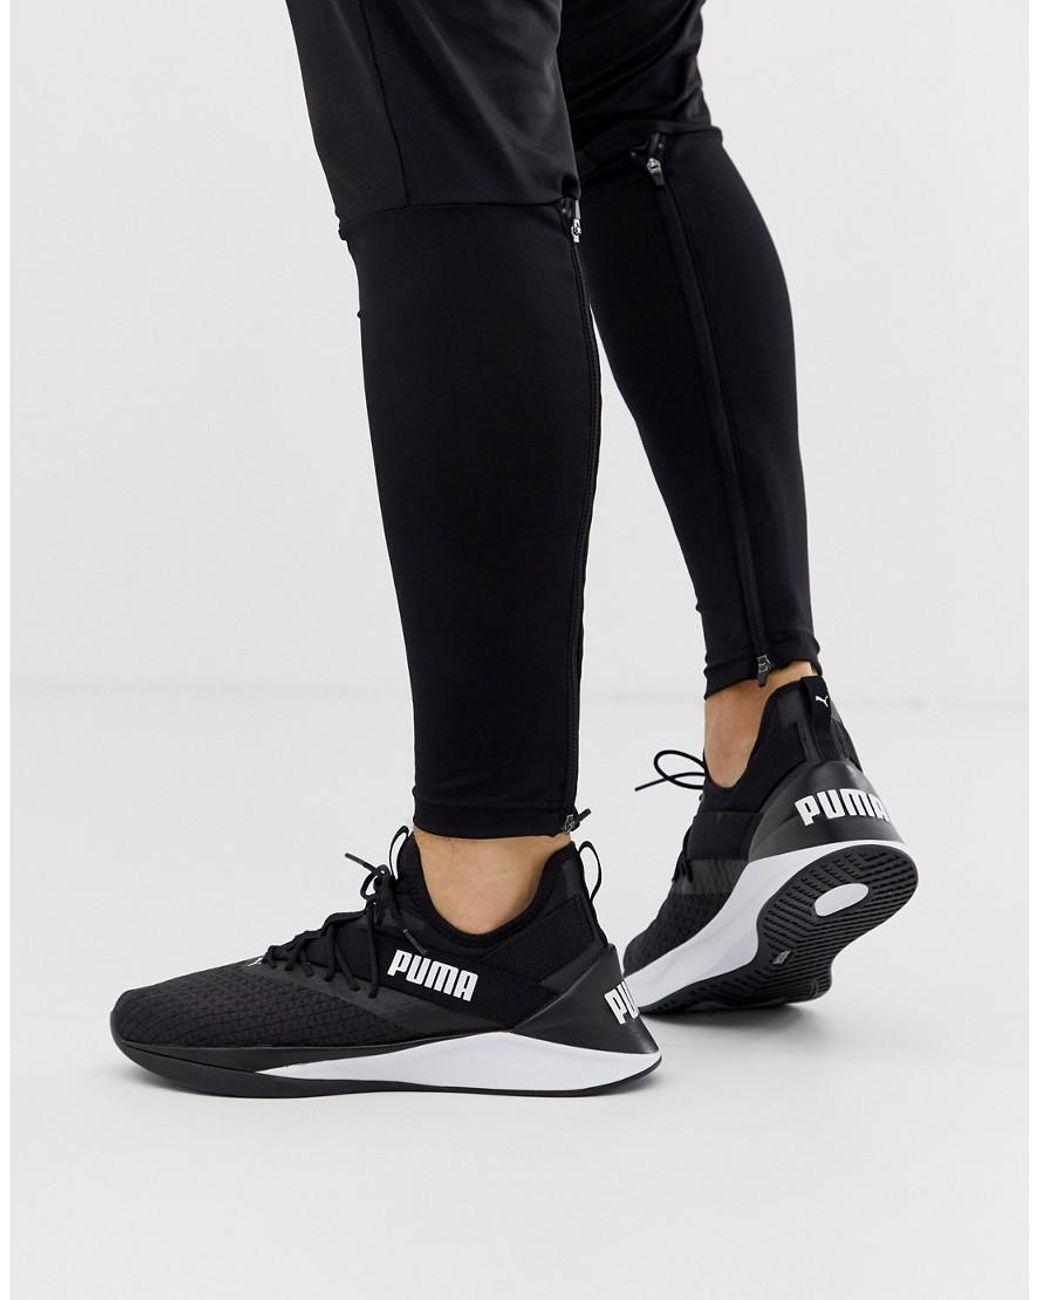 33155c967 Zapatillas de deporte en negro Jaab XT de PUMA de hombre de color Negro -  Lyst